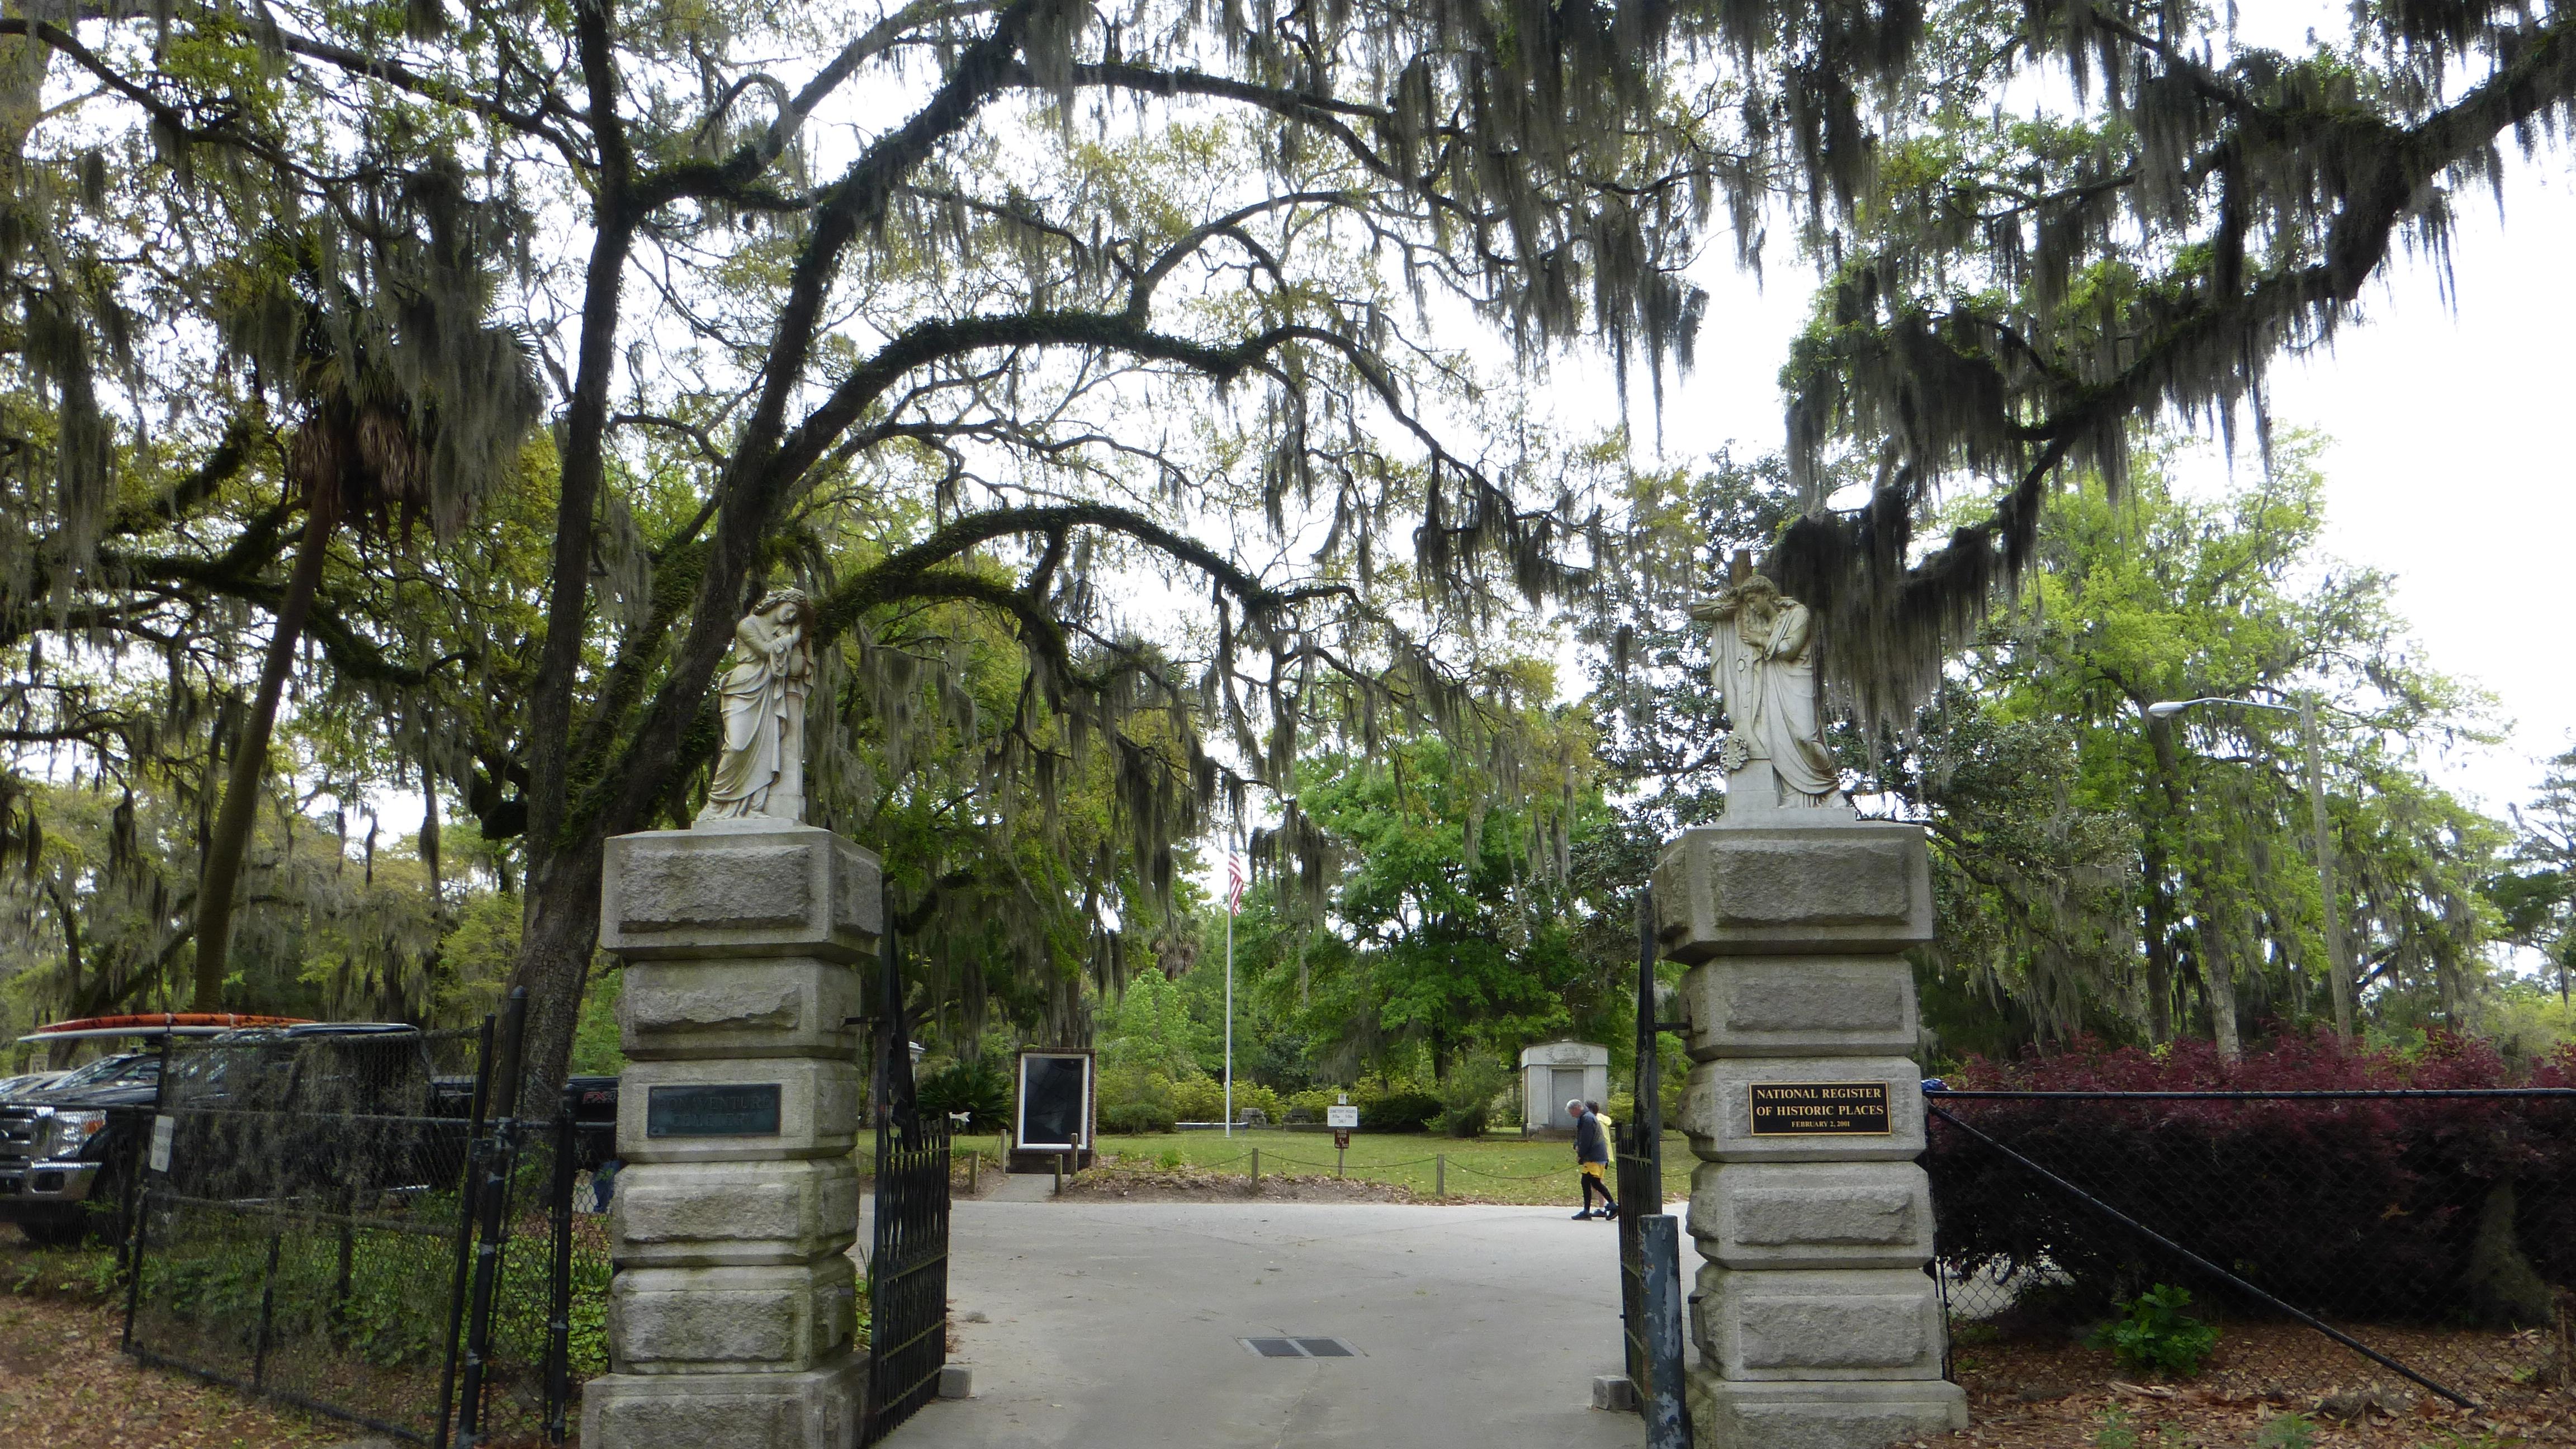 Bonaventure Cemetery And Tybee Island Sightseeing In